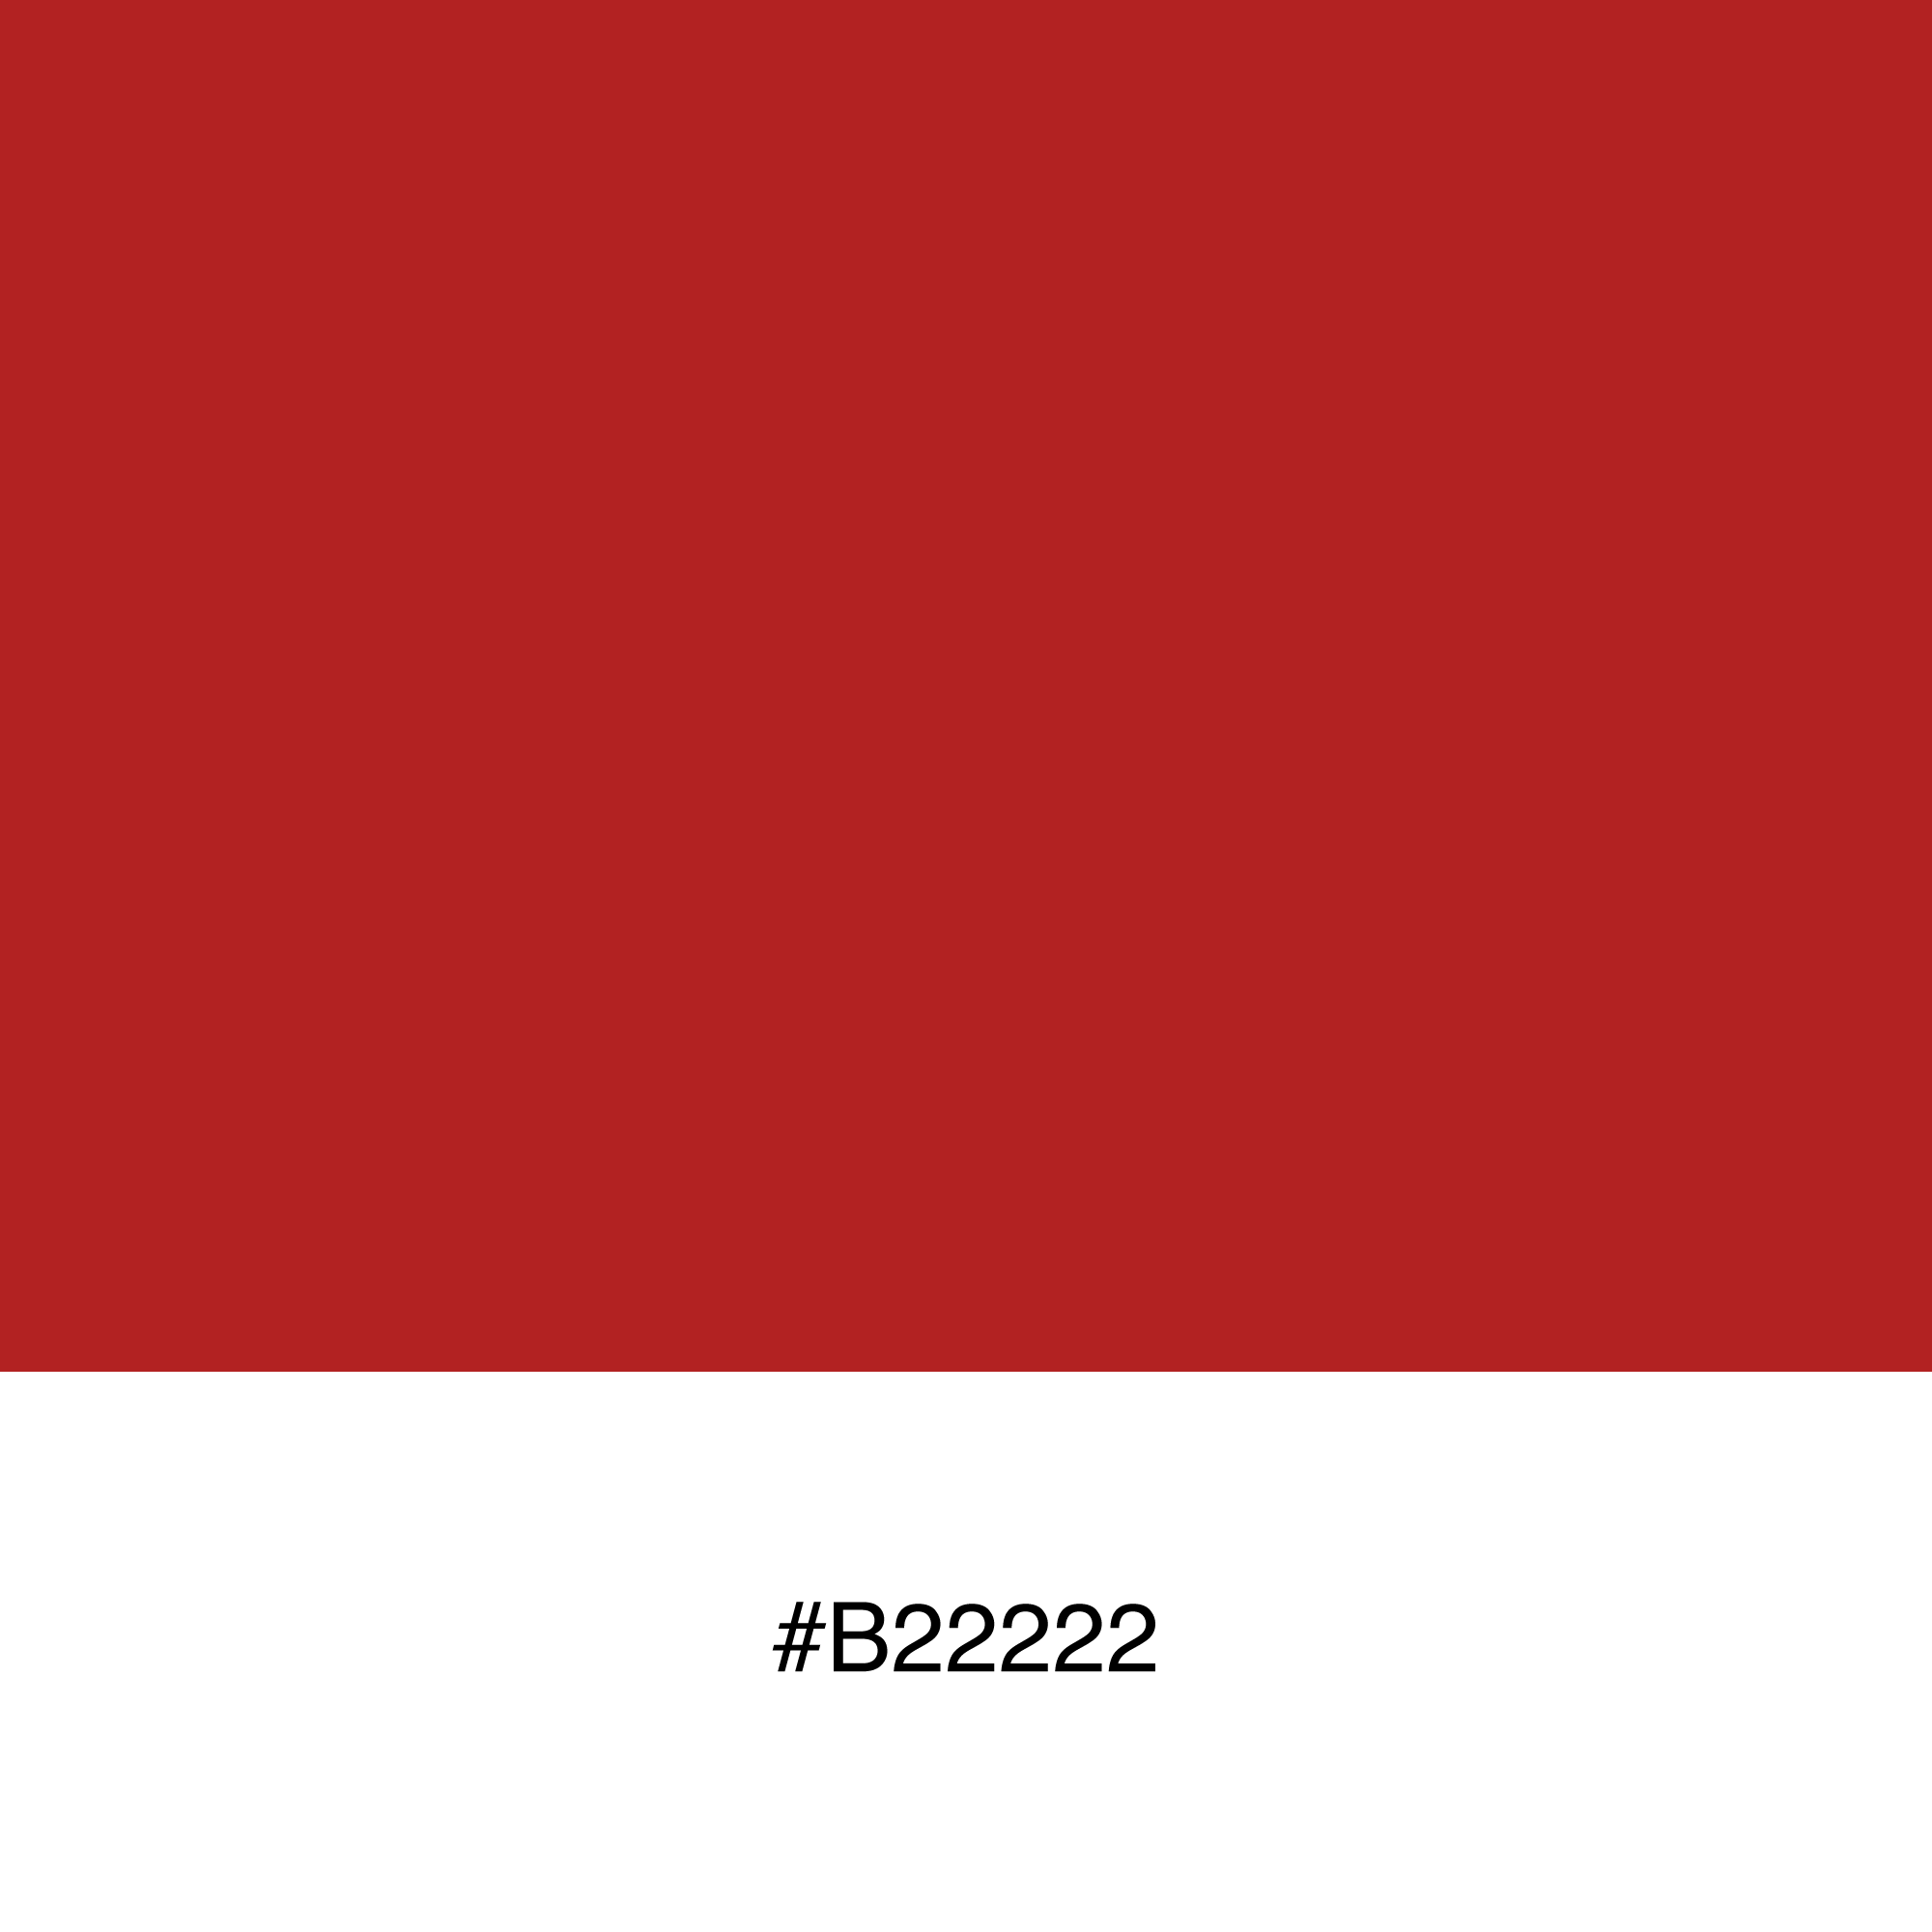 color-swatch-b22222